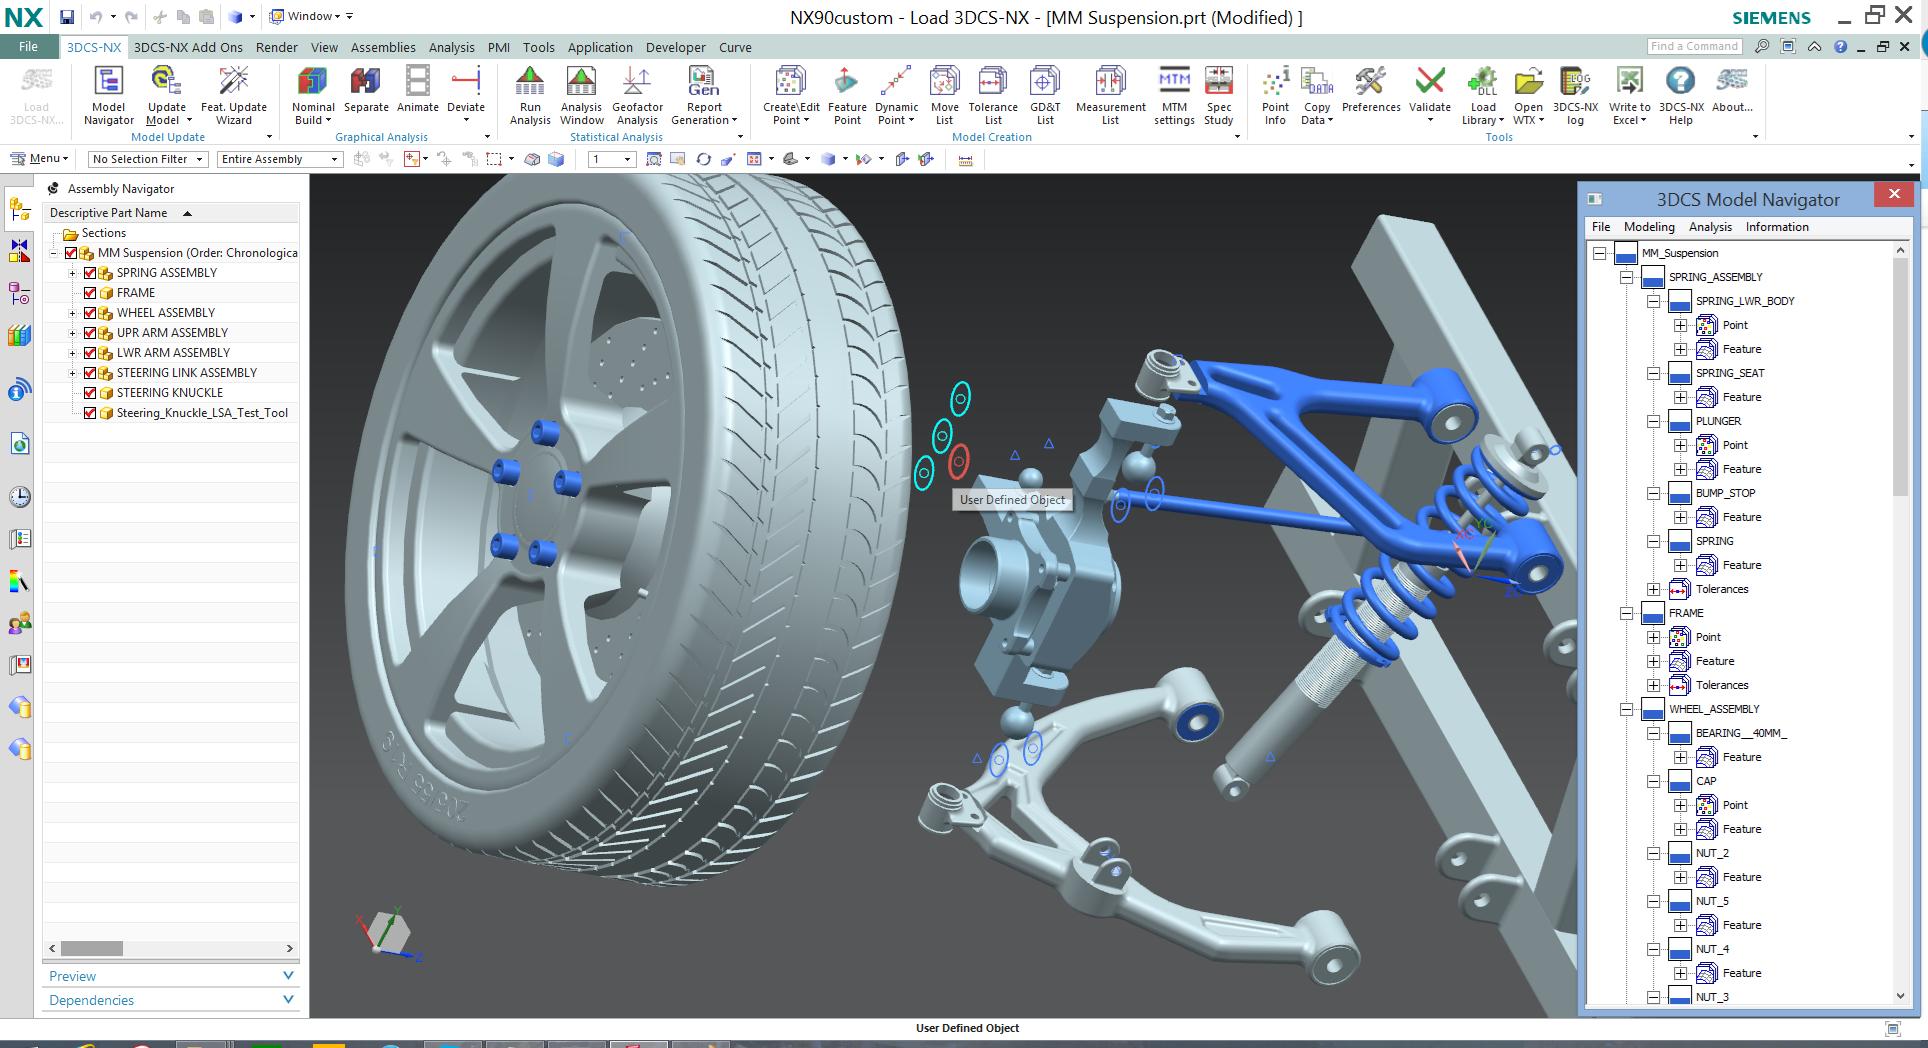 3DCS for NX Webinar: 3DCS Mechanical Modeler and Degree of Freedom Counter